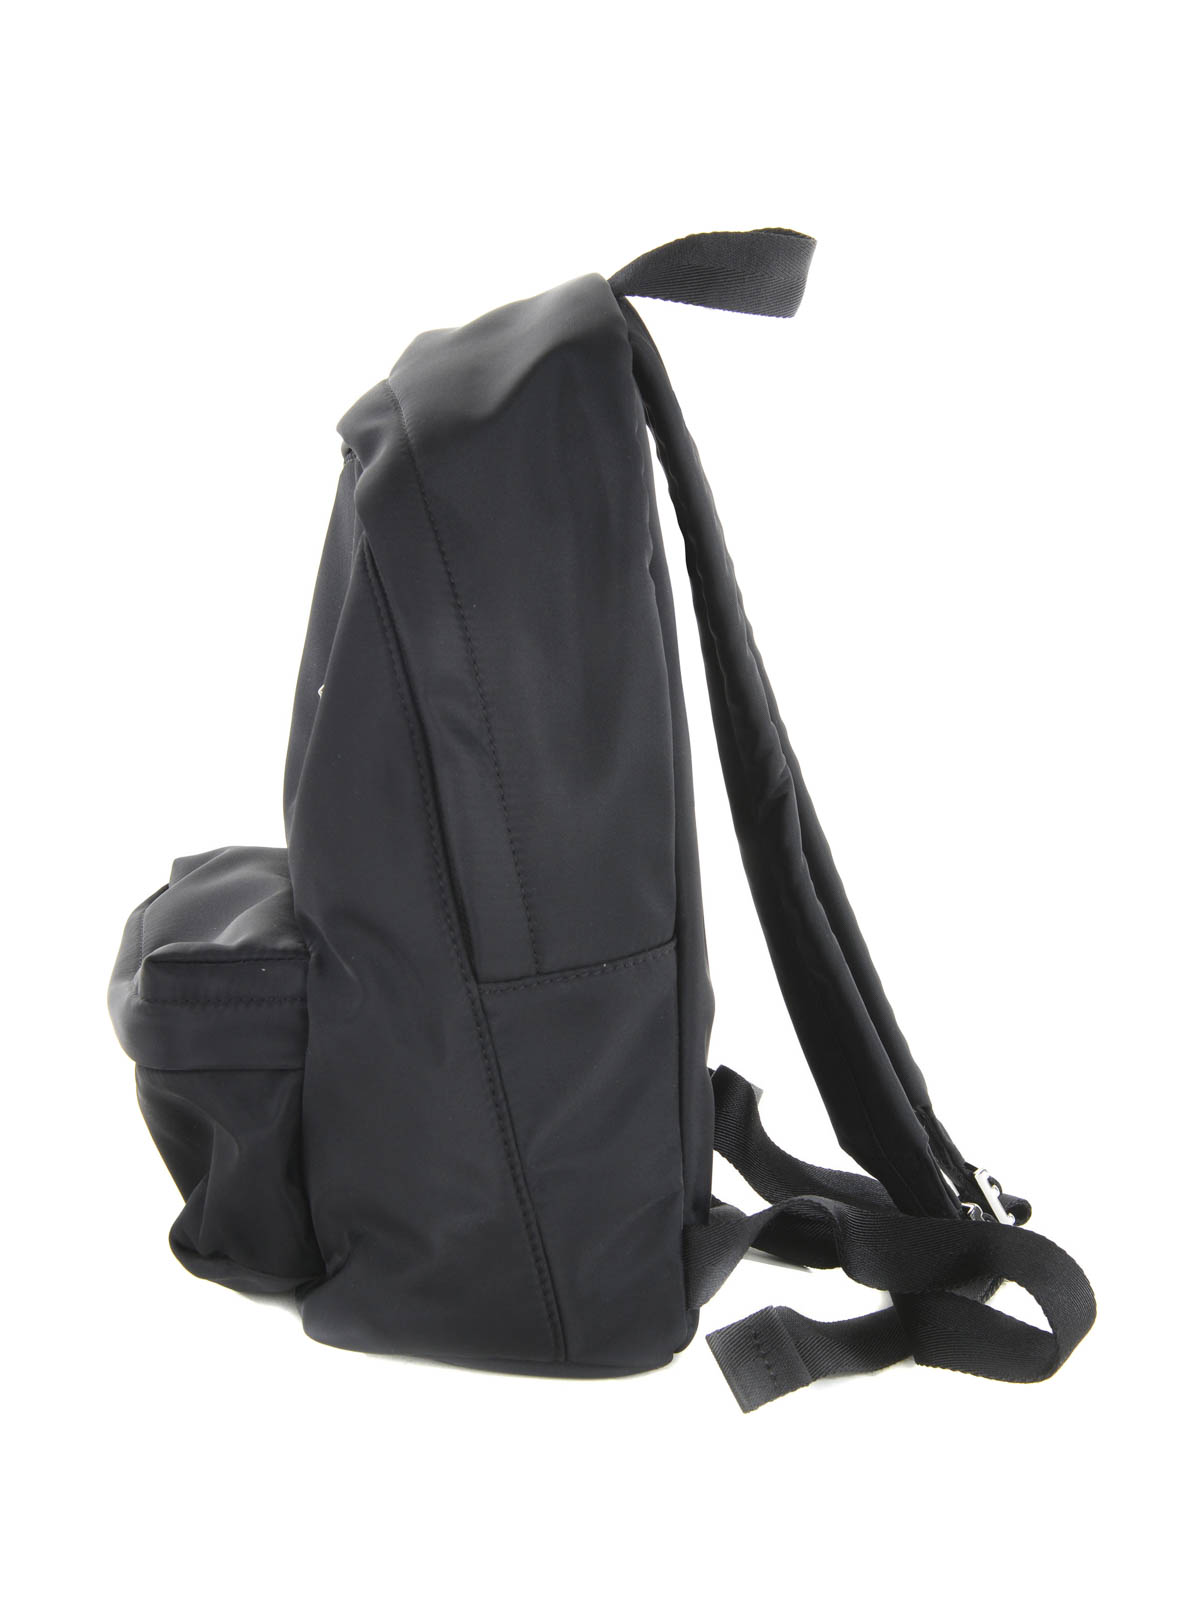 Versus Versace  backpacks online - LION HEAD DETAIL NYLON BACKPACK 043cec5796d52